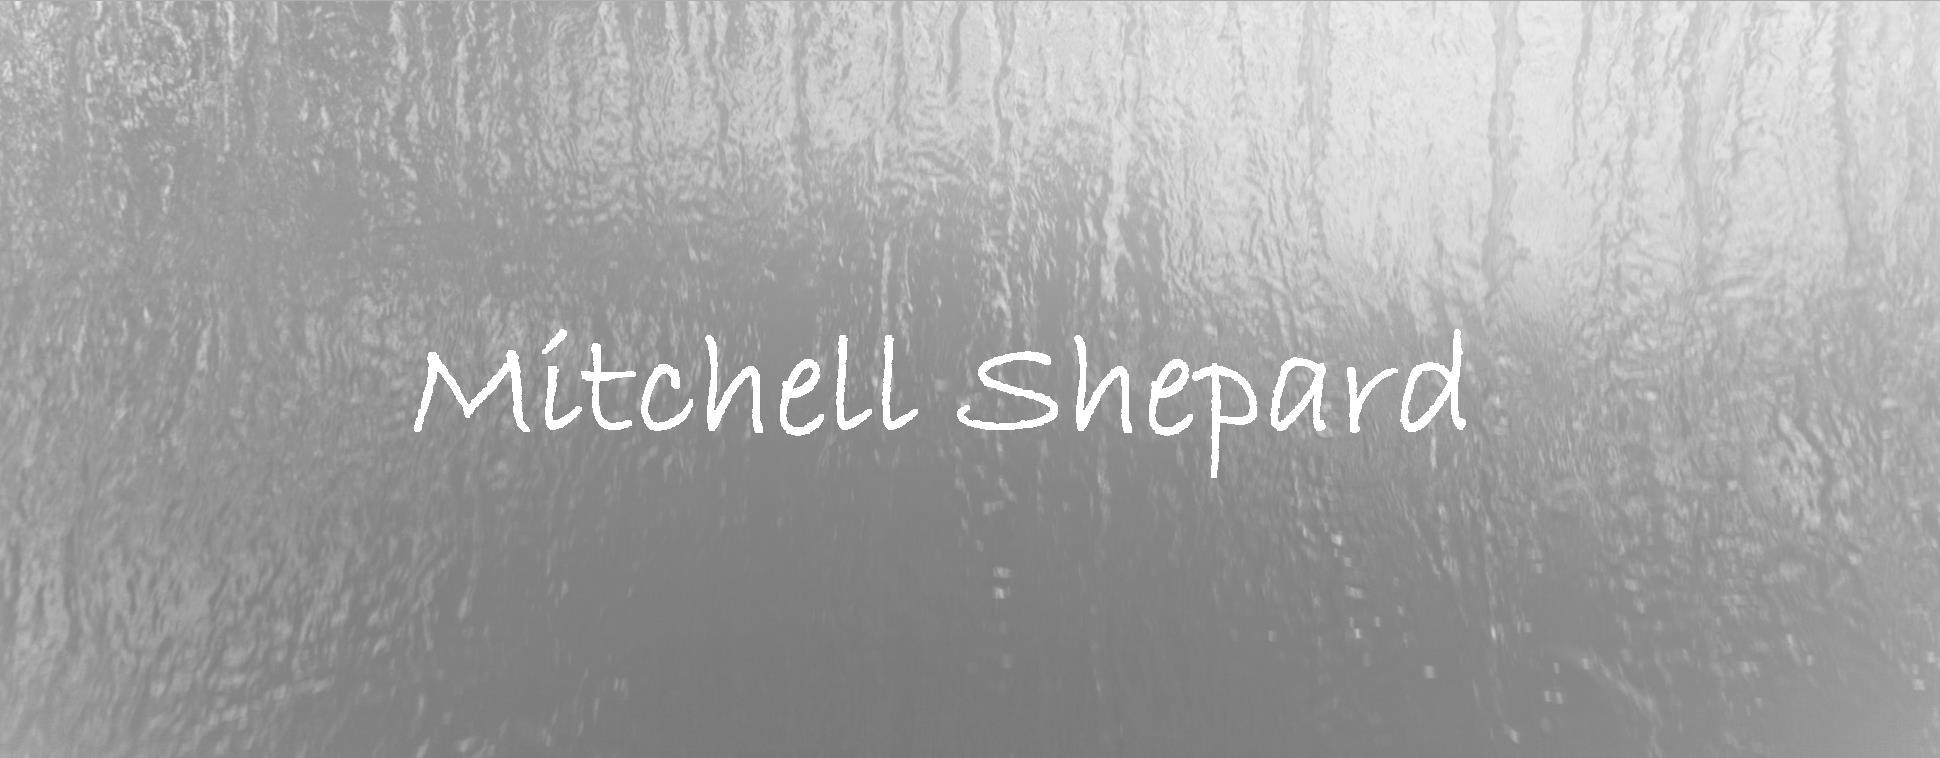 Mitchell Shepard.jpg